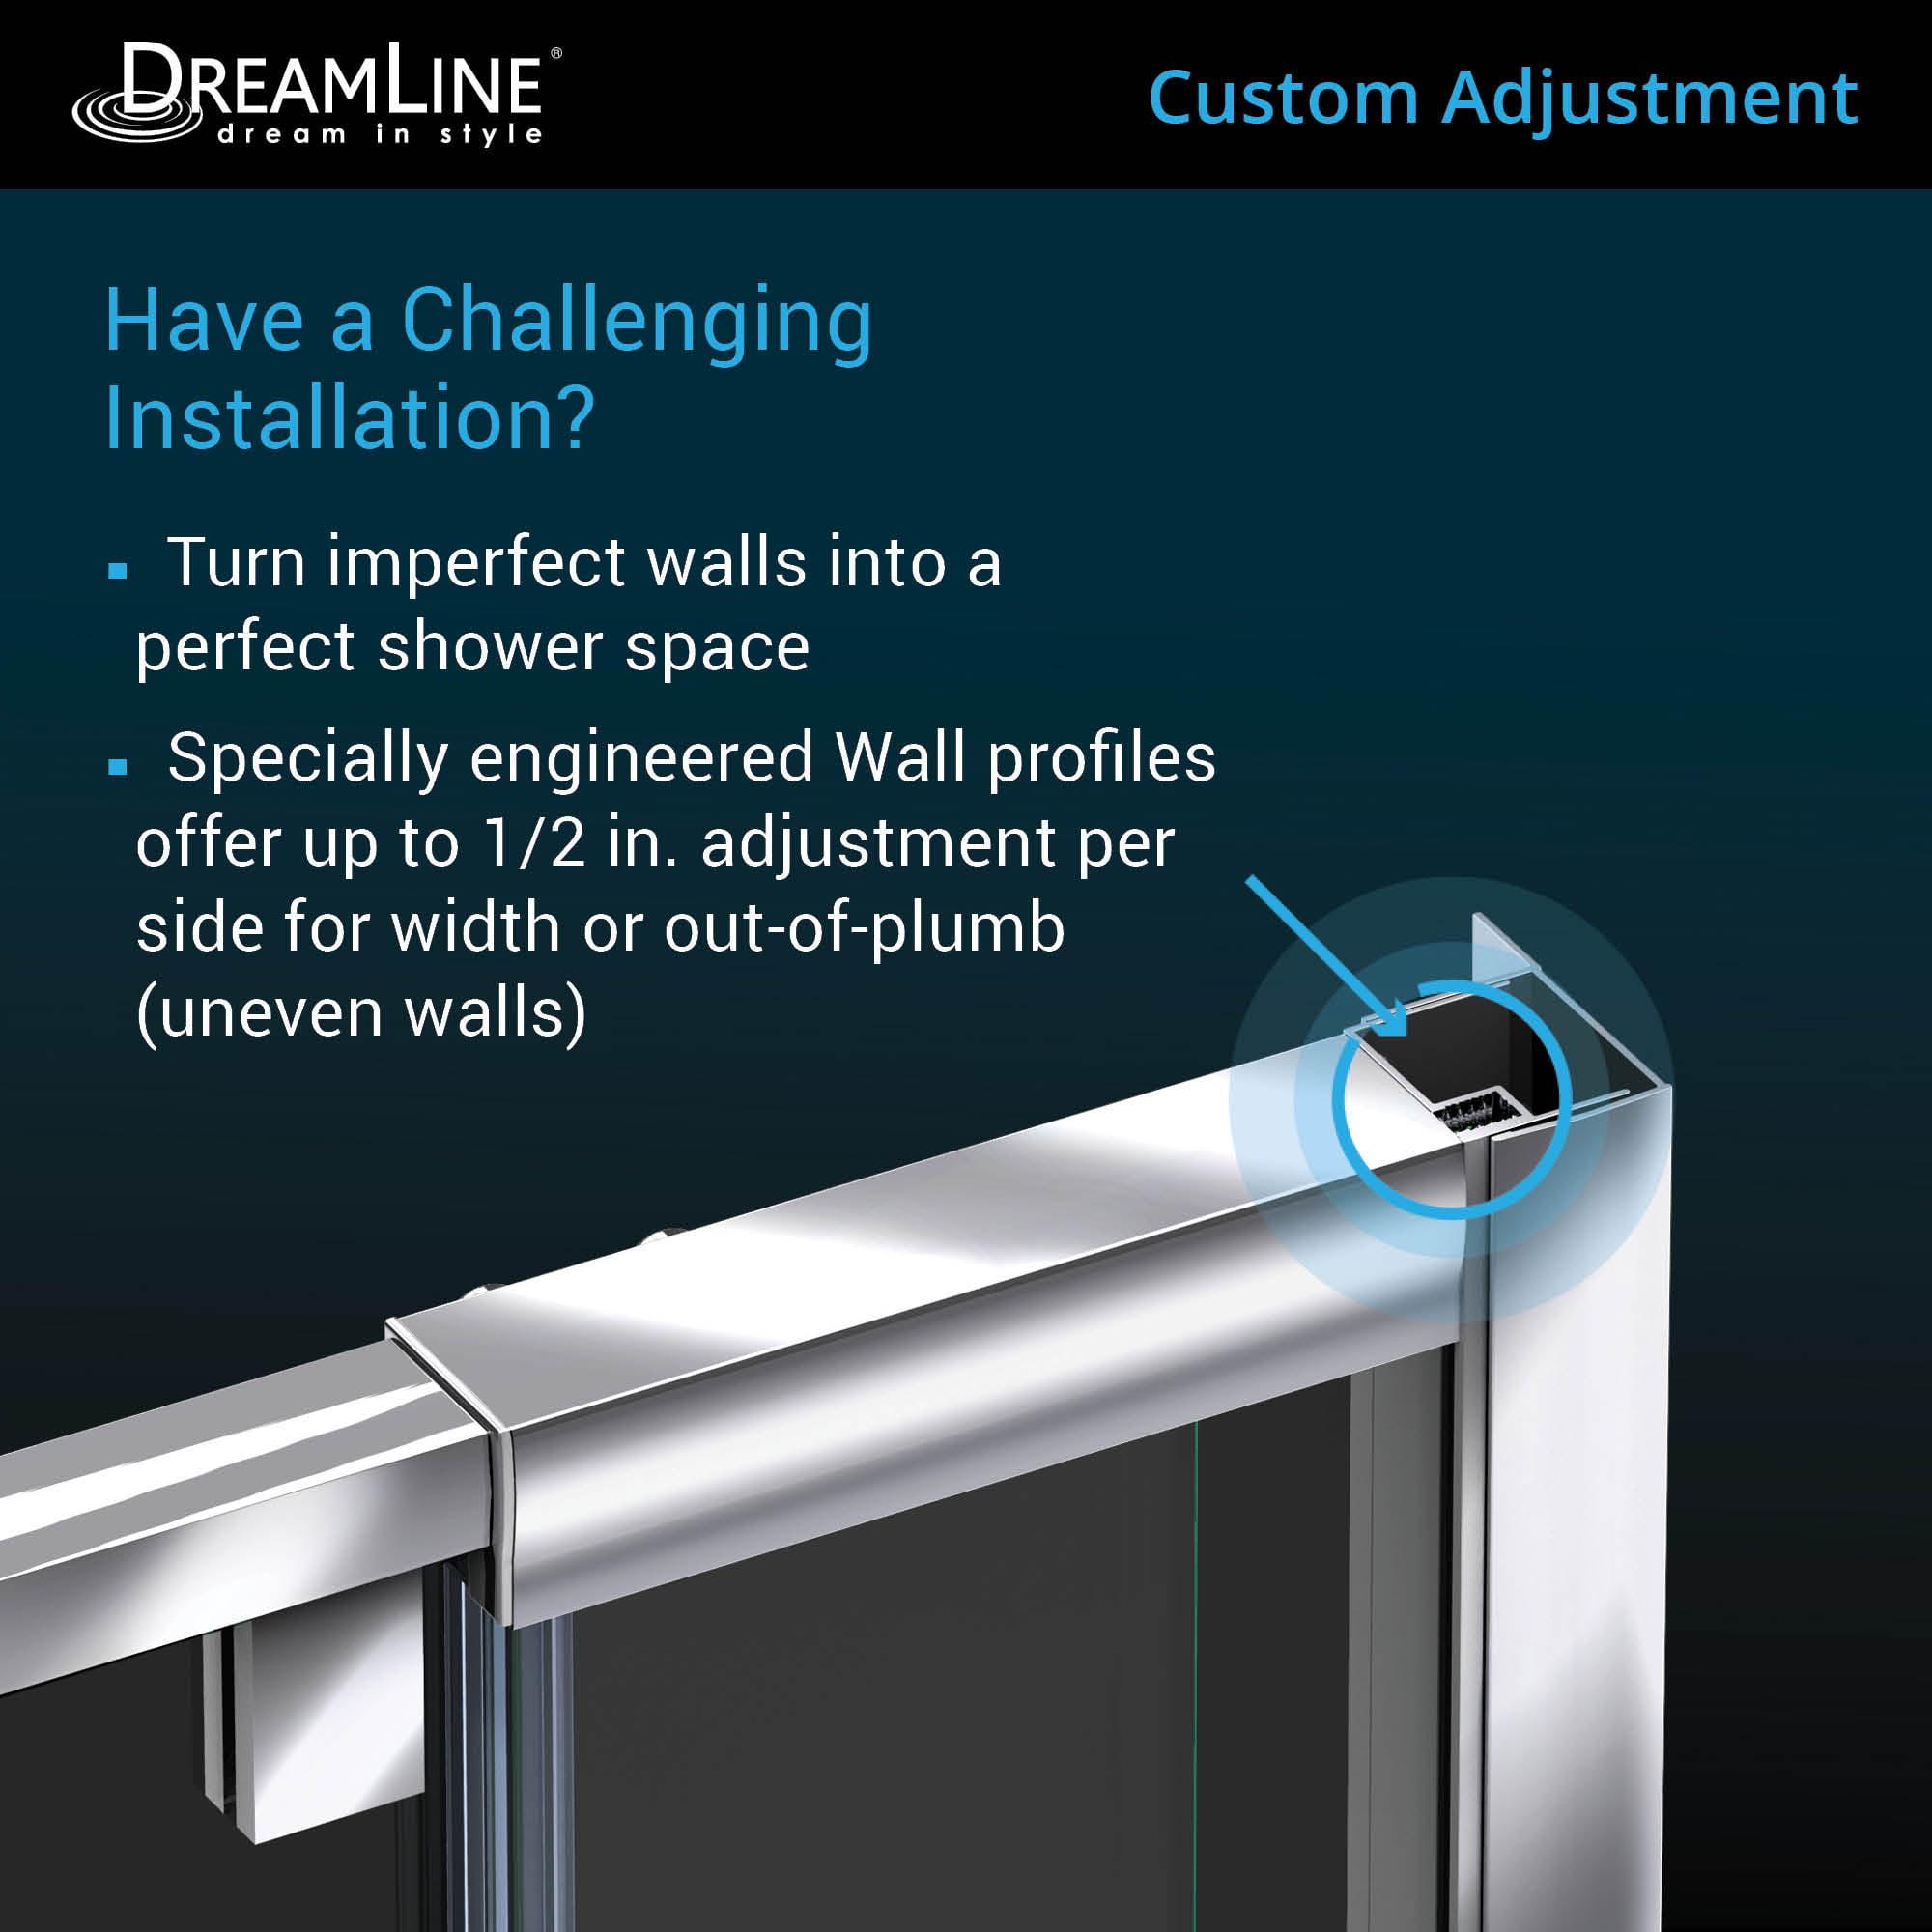 Dreamline Flex 34 1 2 In D X 44 48 In W X 72 In H Semi Frameless Pivot Shower Enclosure In Brushed Nickel Walmart Com Walmart Com